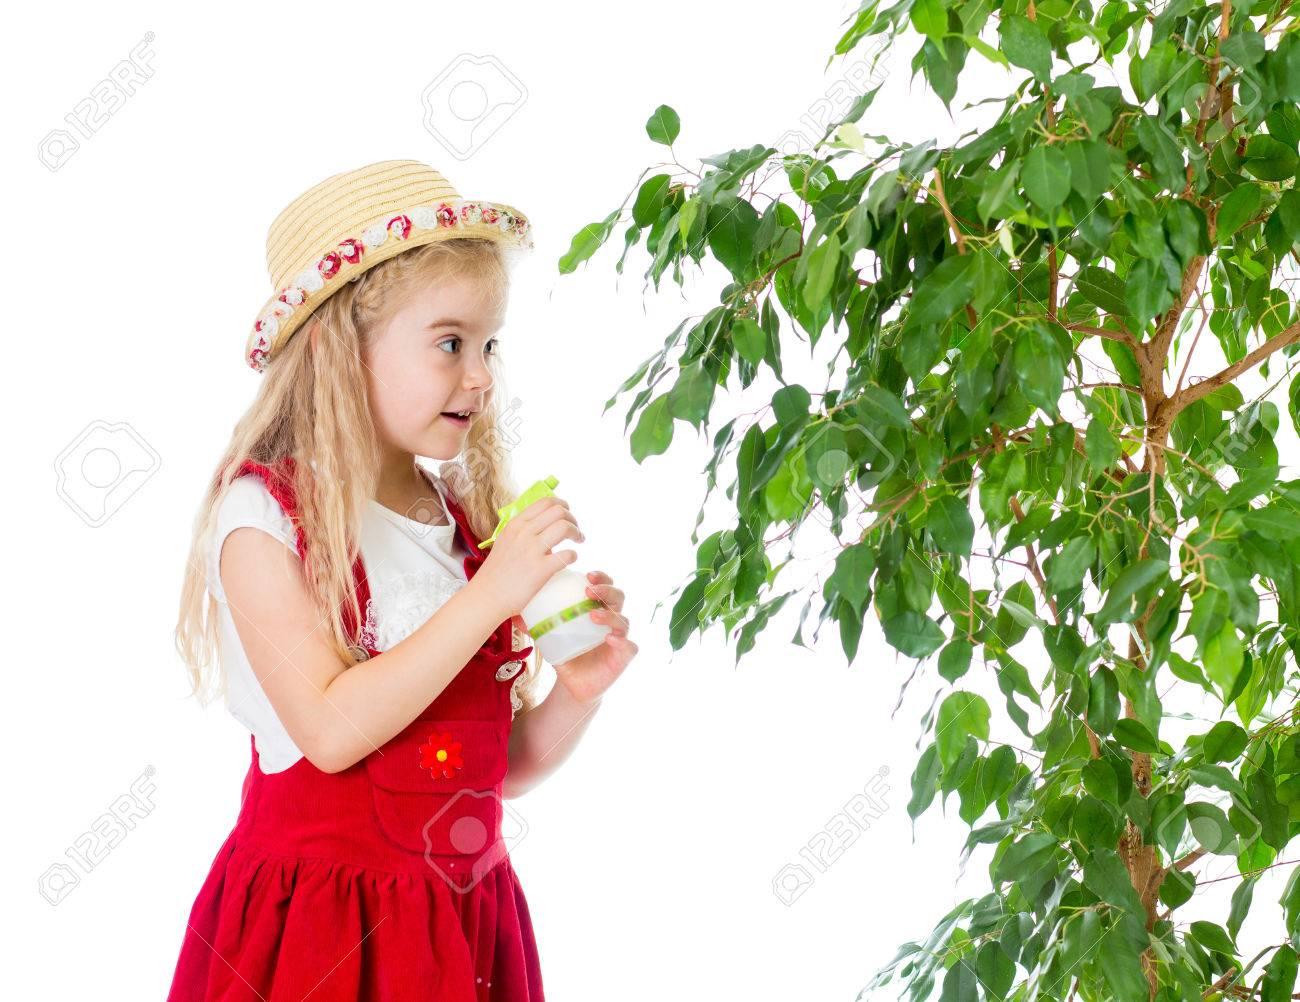 gardener kid wets or waters tree stock photo 23108370